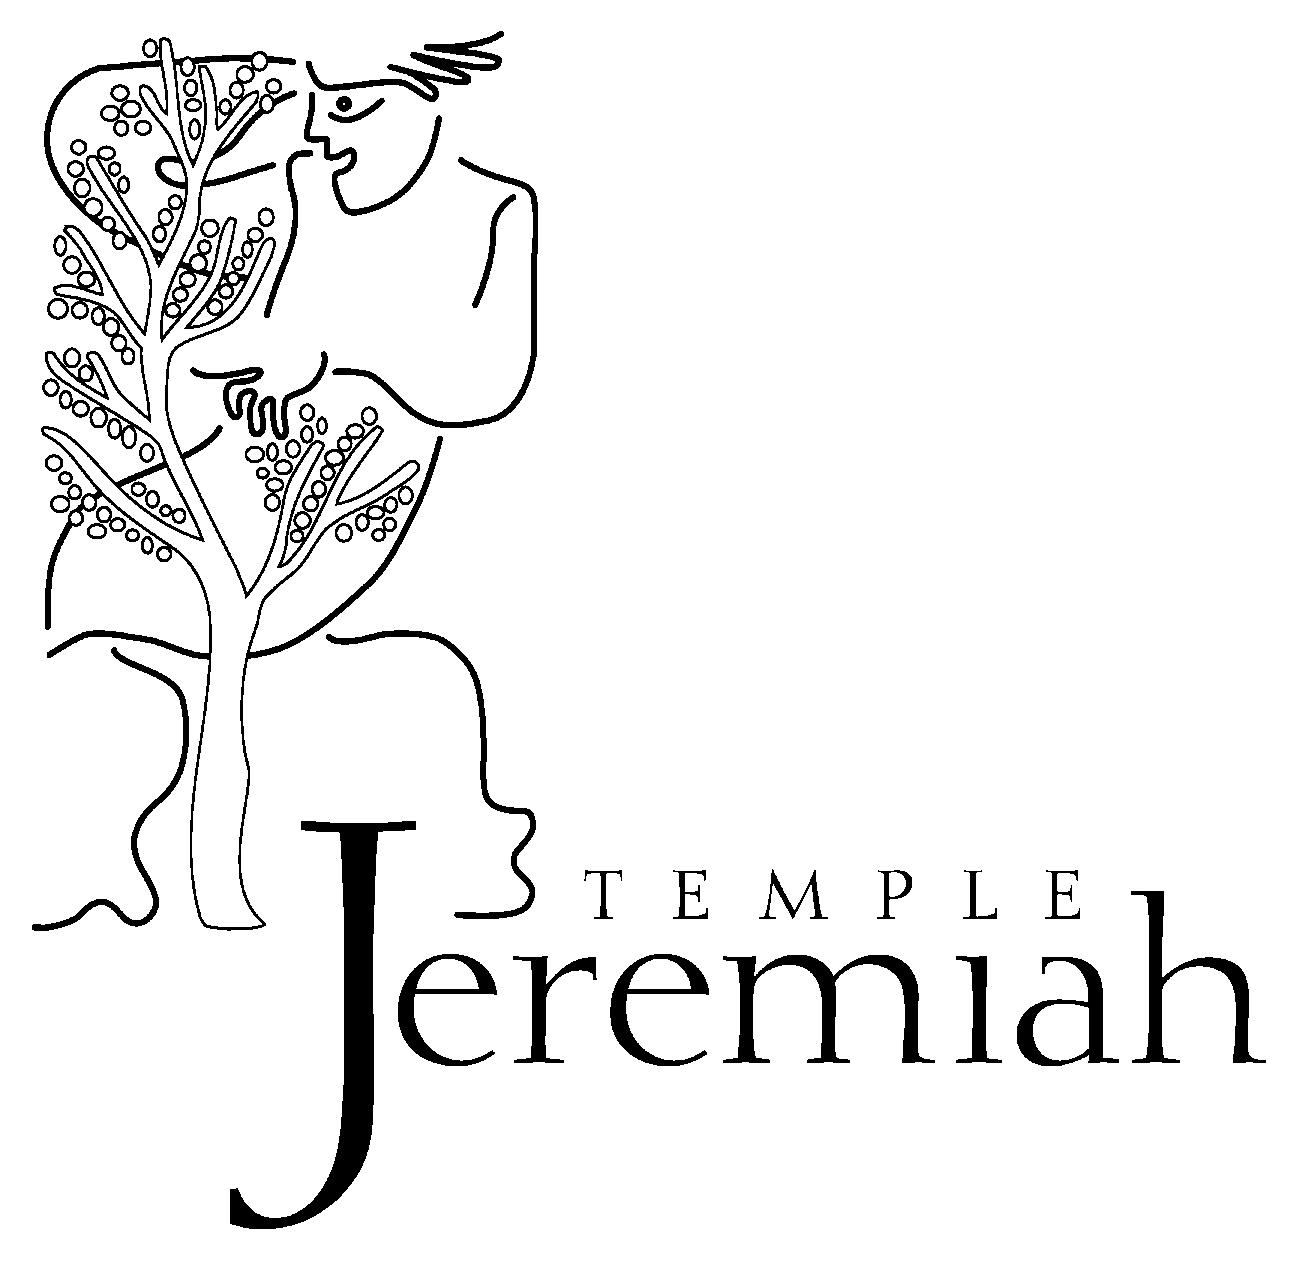 TempleJeremiah.jpg